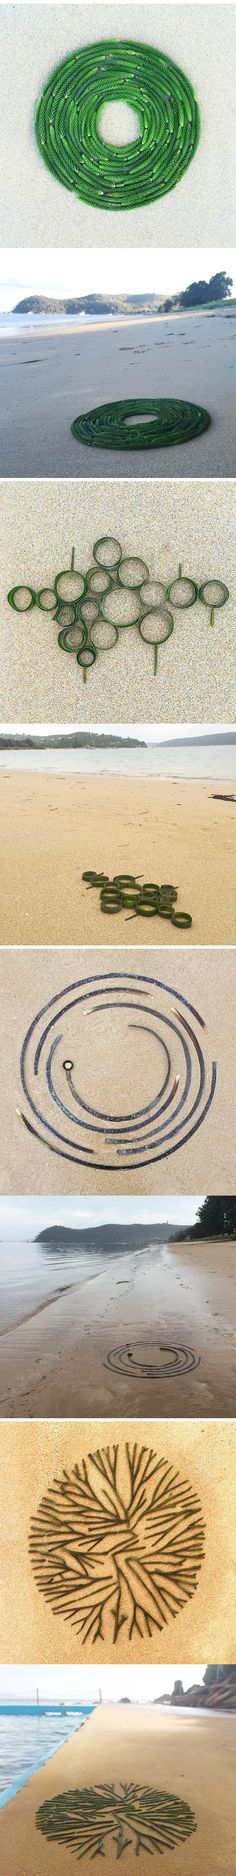 leonie barton (beach debris turned into art. daily project)